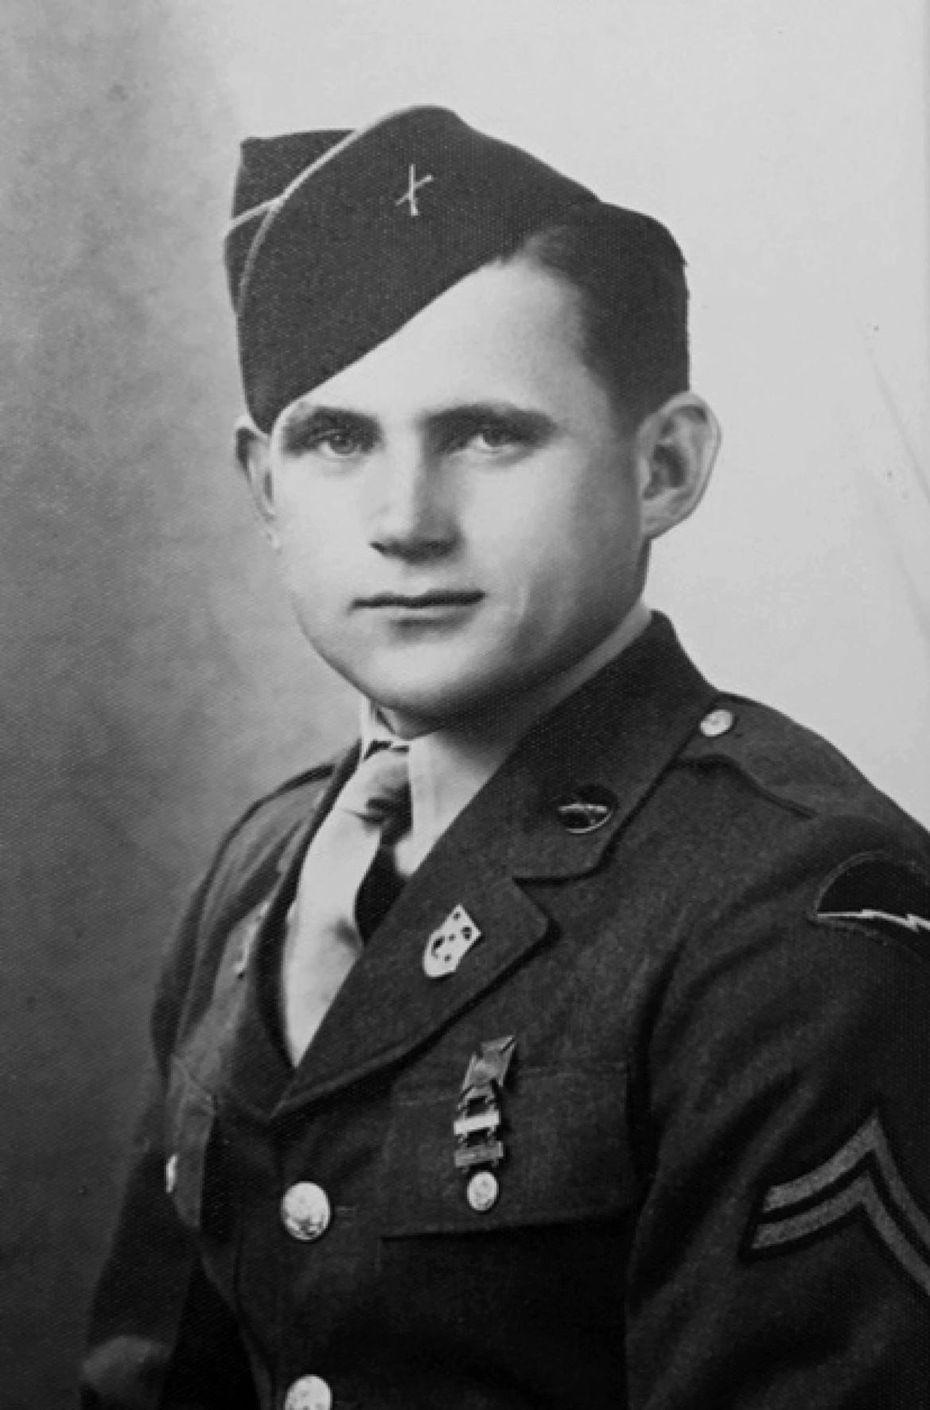 Army Staff Sgt. Leo J. Husak